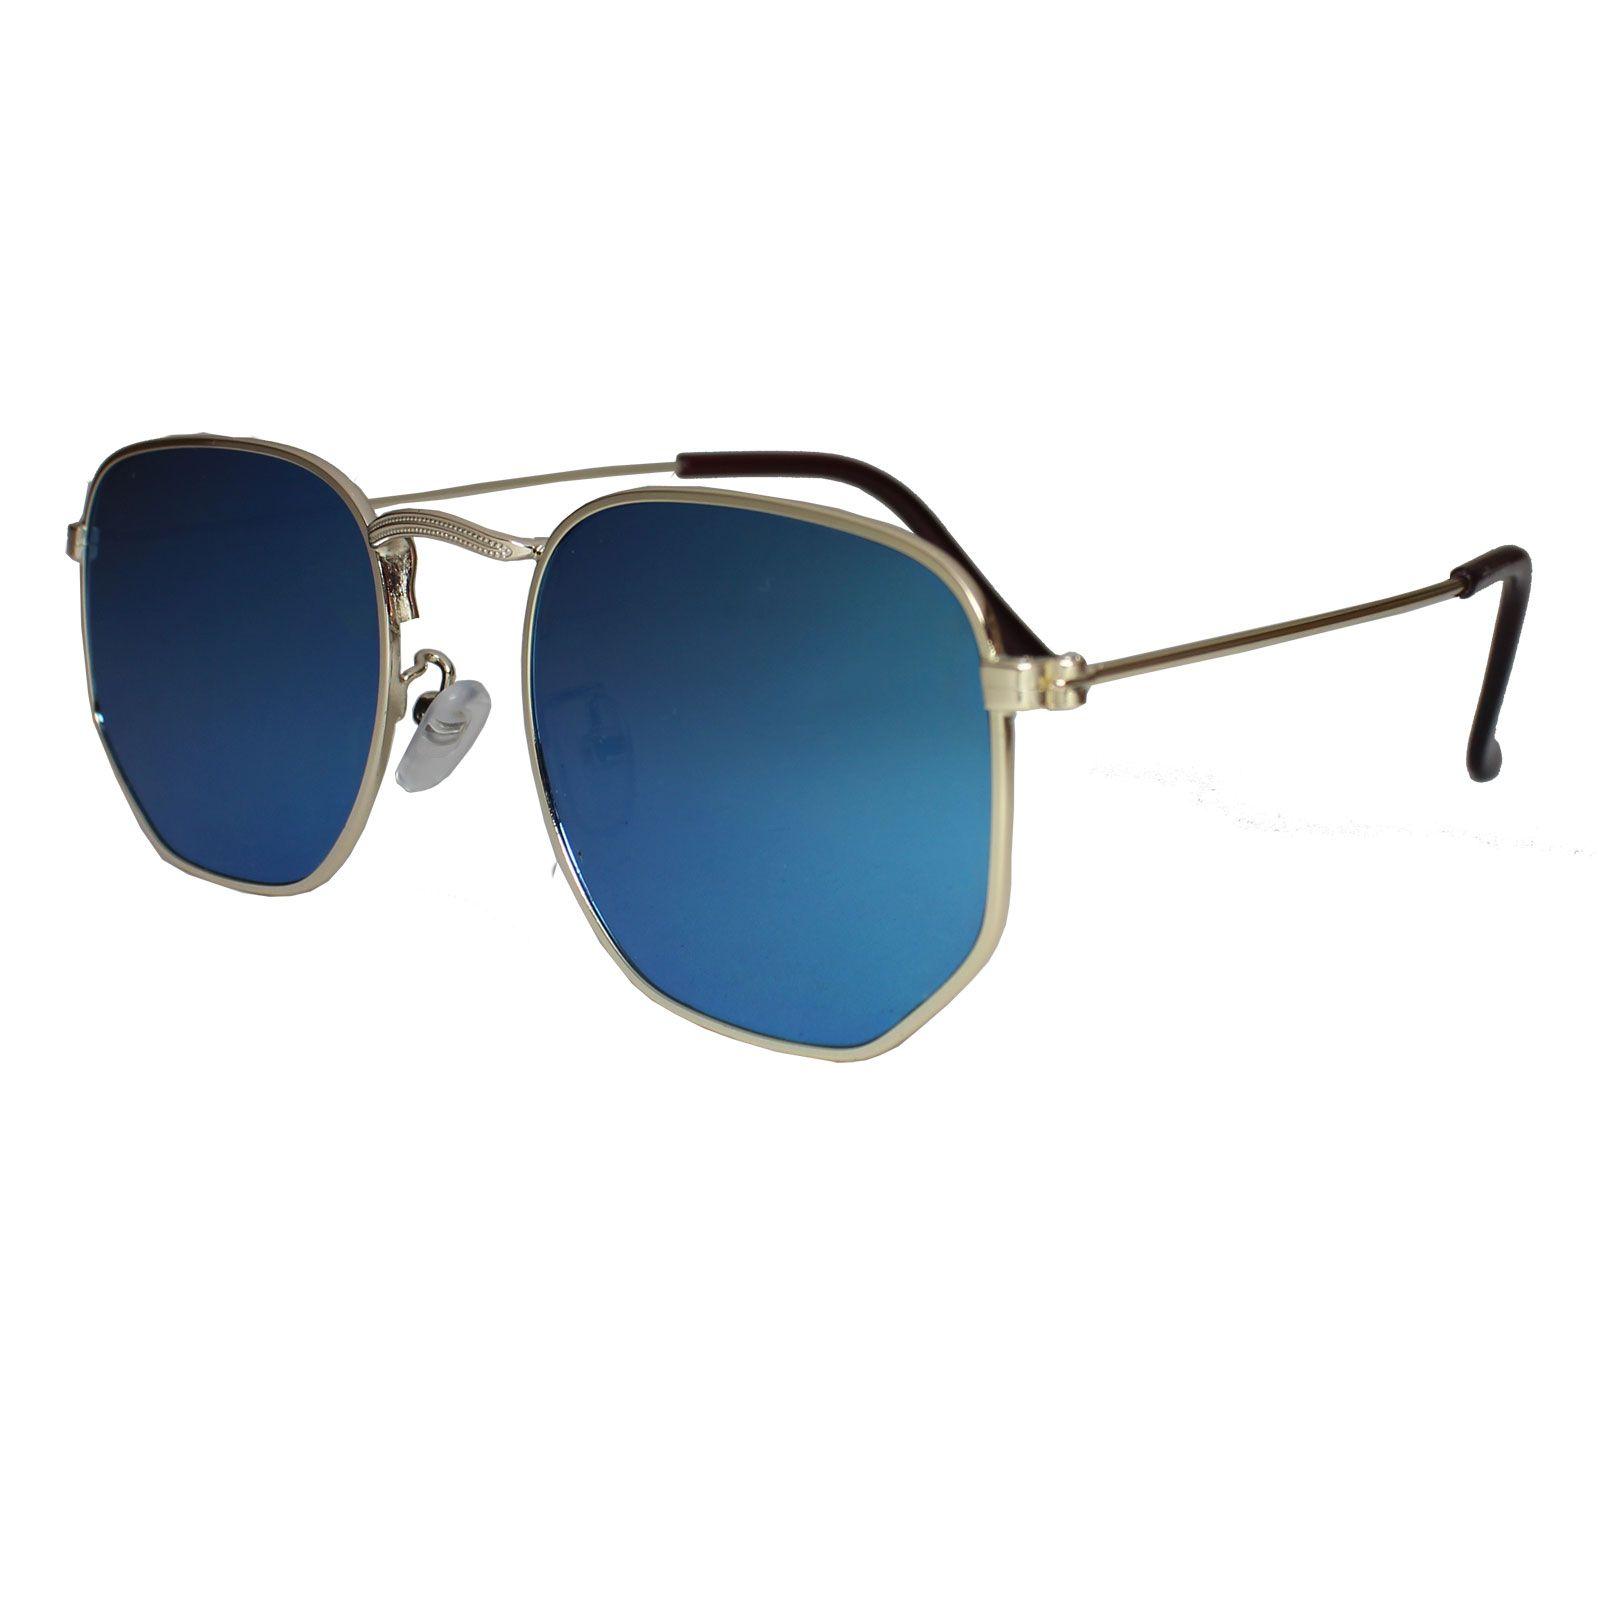 Óculos De Sol Díspar D1625 Hexagonal Lentes Retas Azul